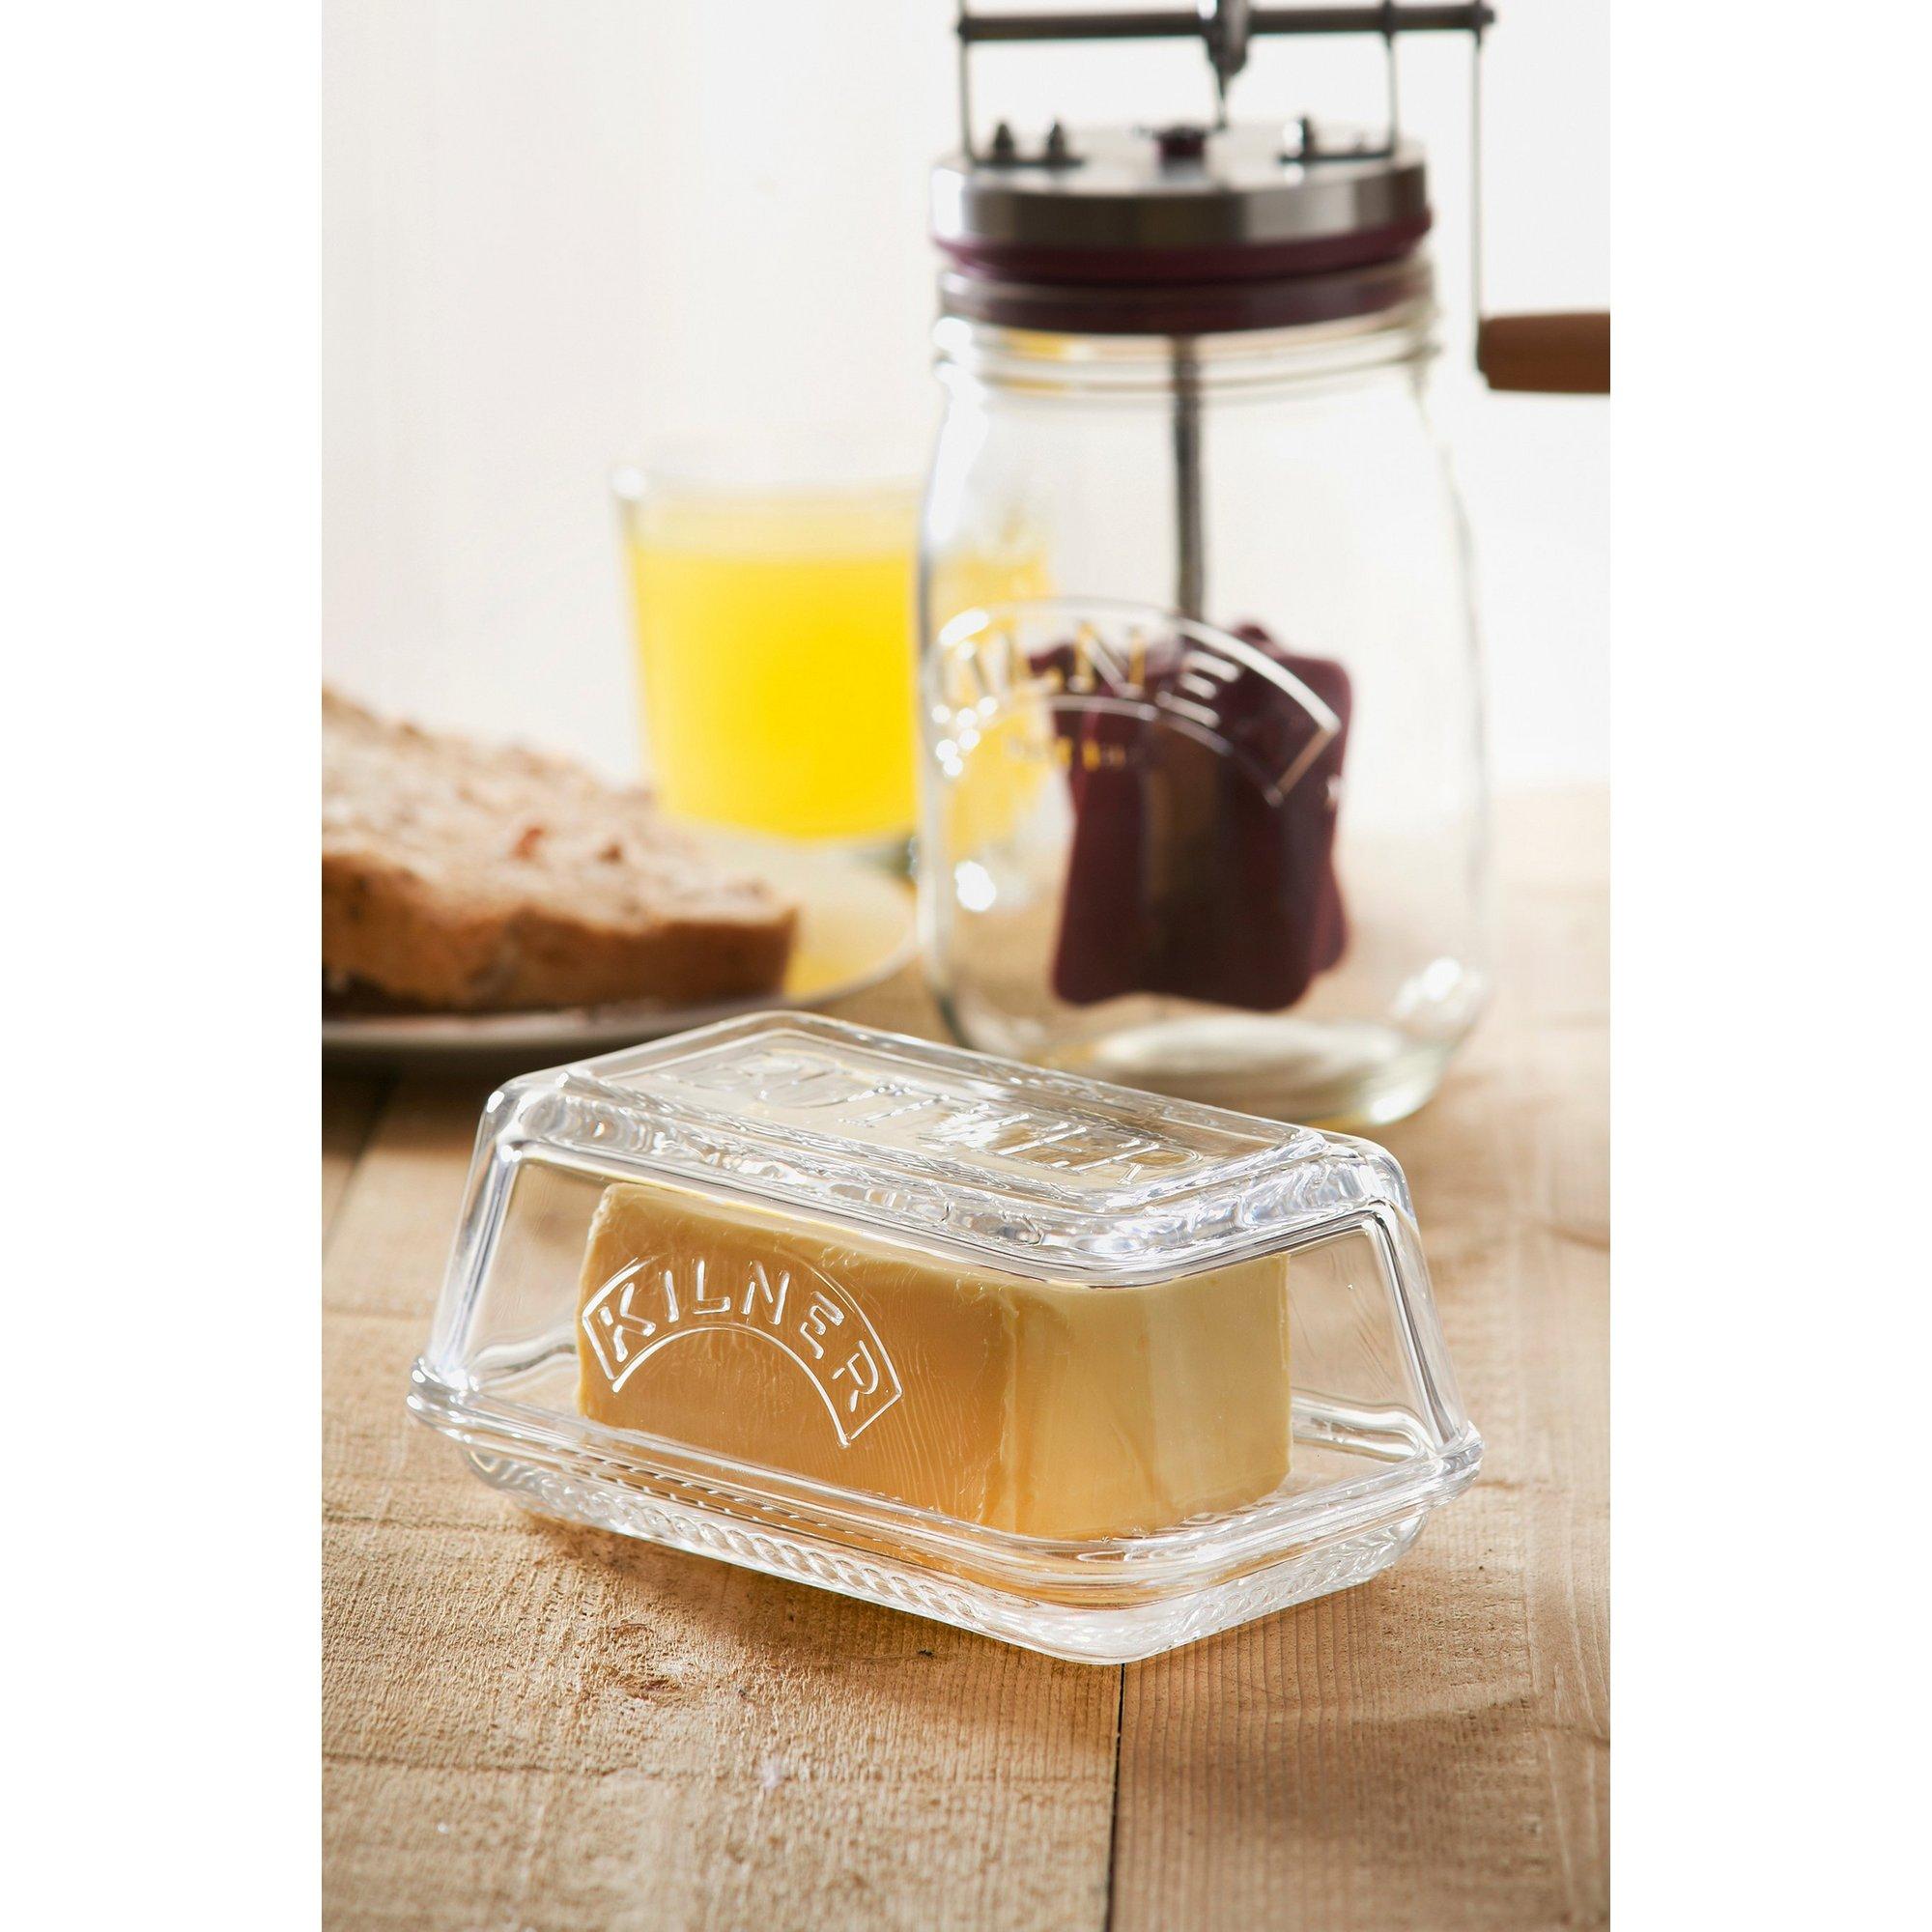 Image of Kilner Glass Butter Dish